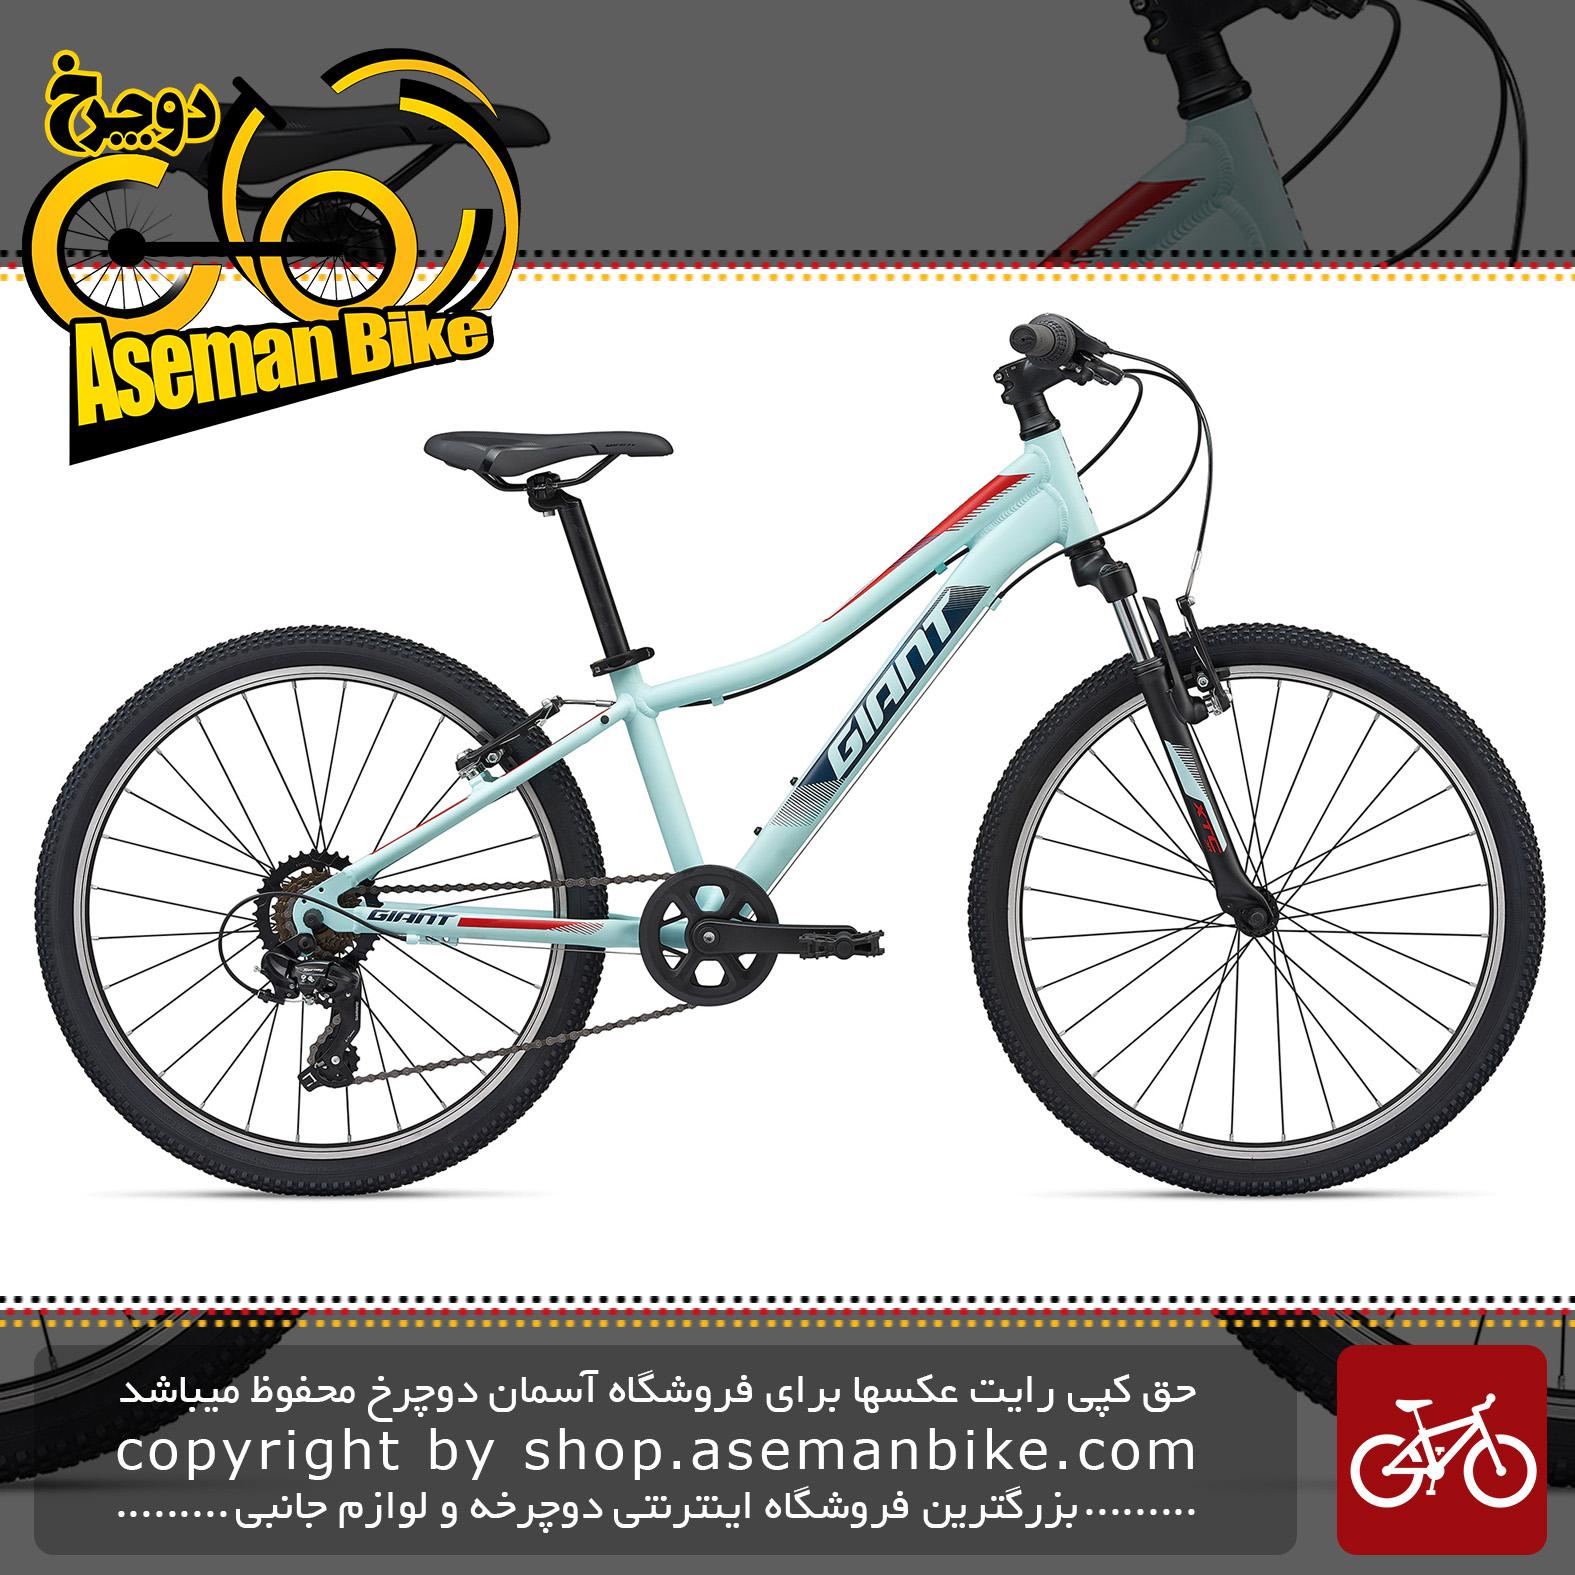 دوچرخه کوهستان جاینت مدل ایکس تی سی جی آر 24 اینچ 2020 Giant Mountain Bicycle XTC Jr 24 2020